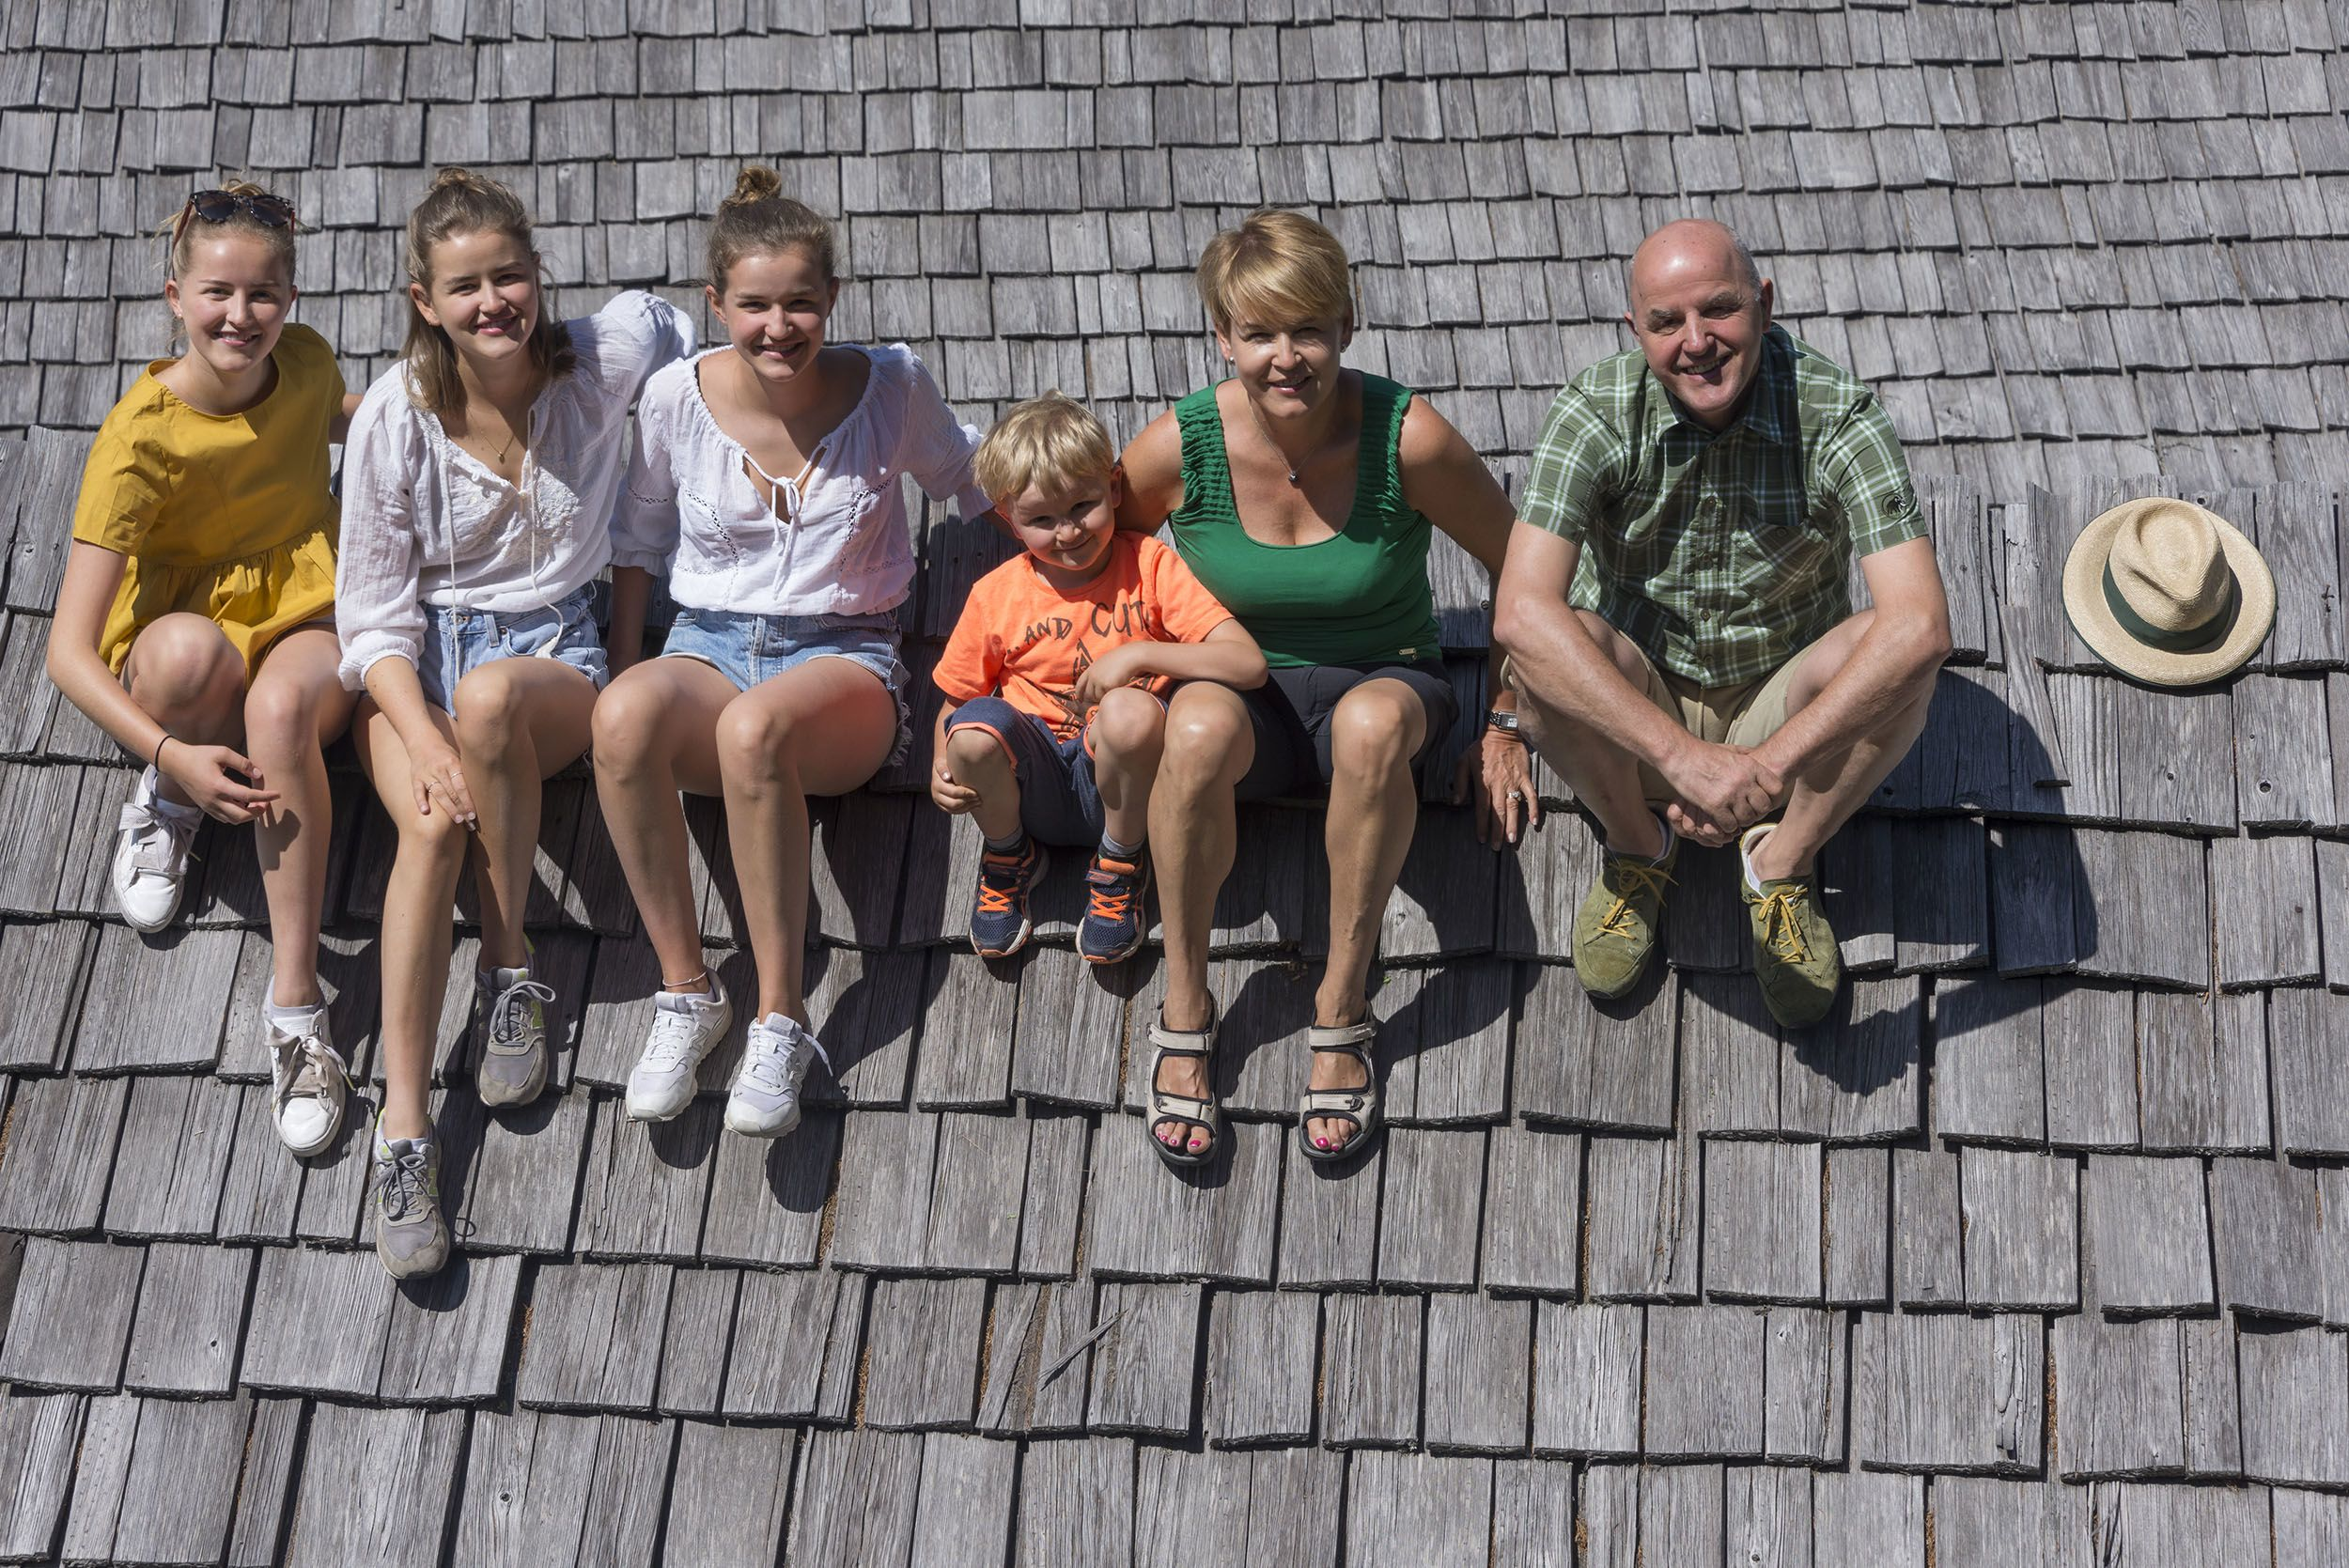 Familie Hinteregger vom Hotel Lüsnerhof